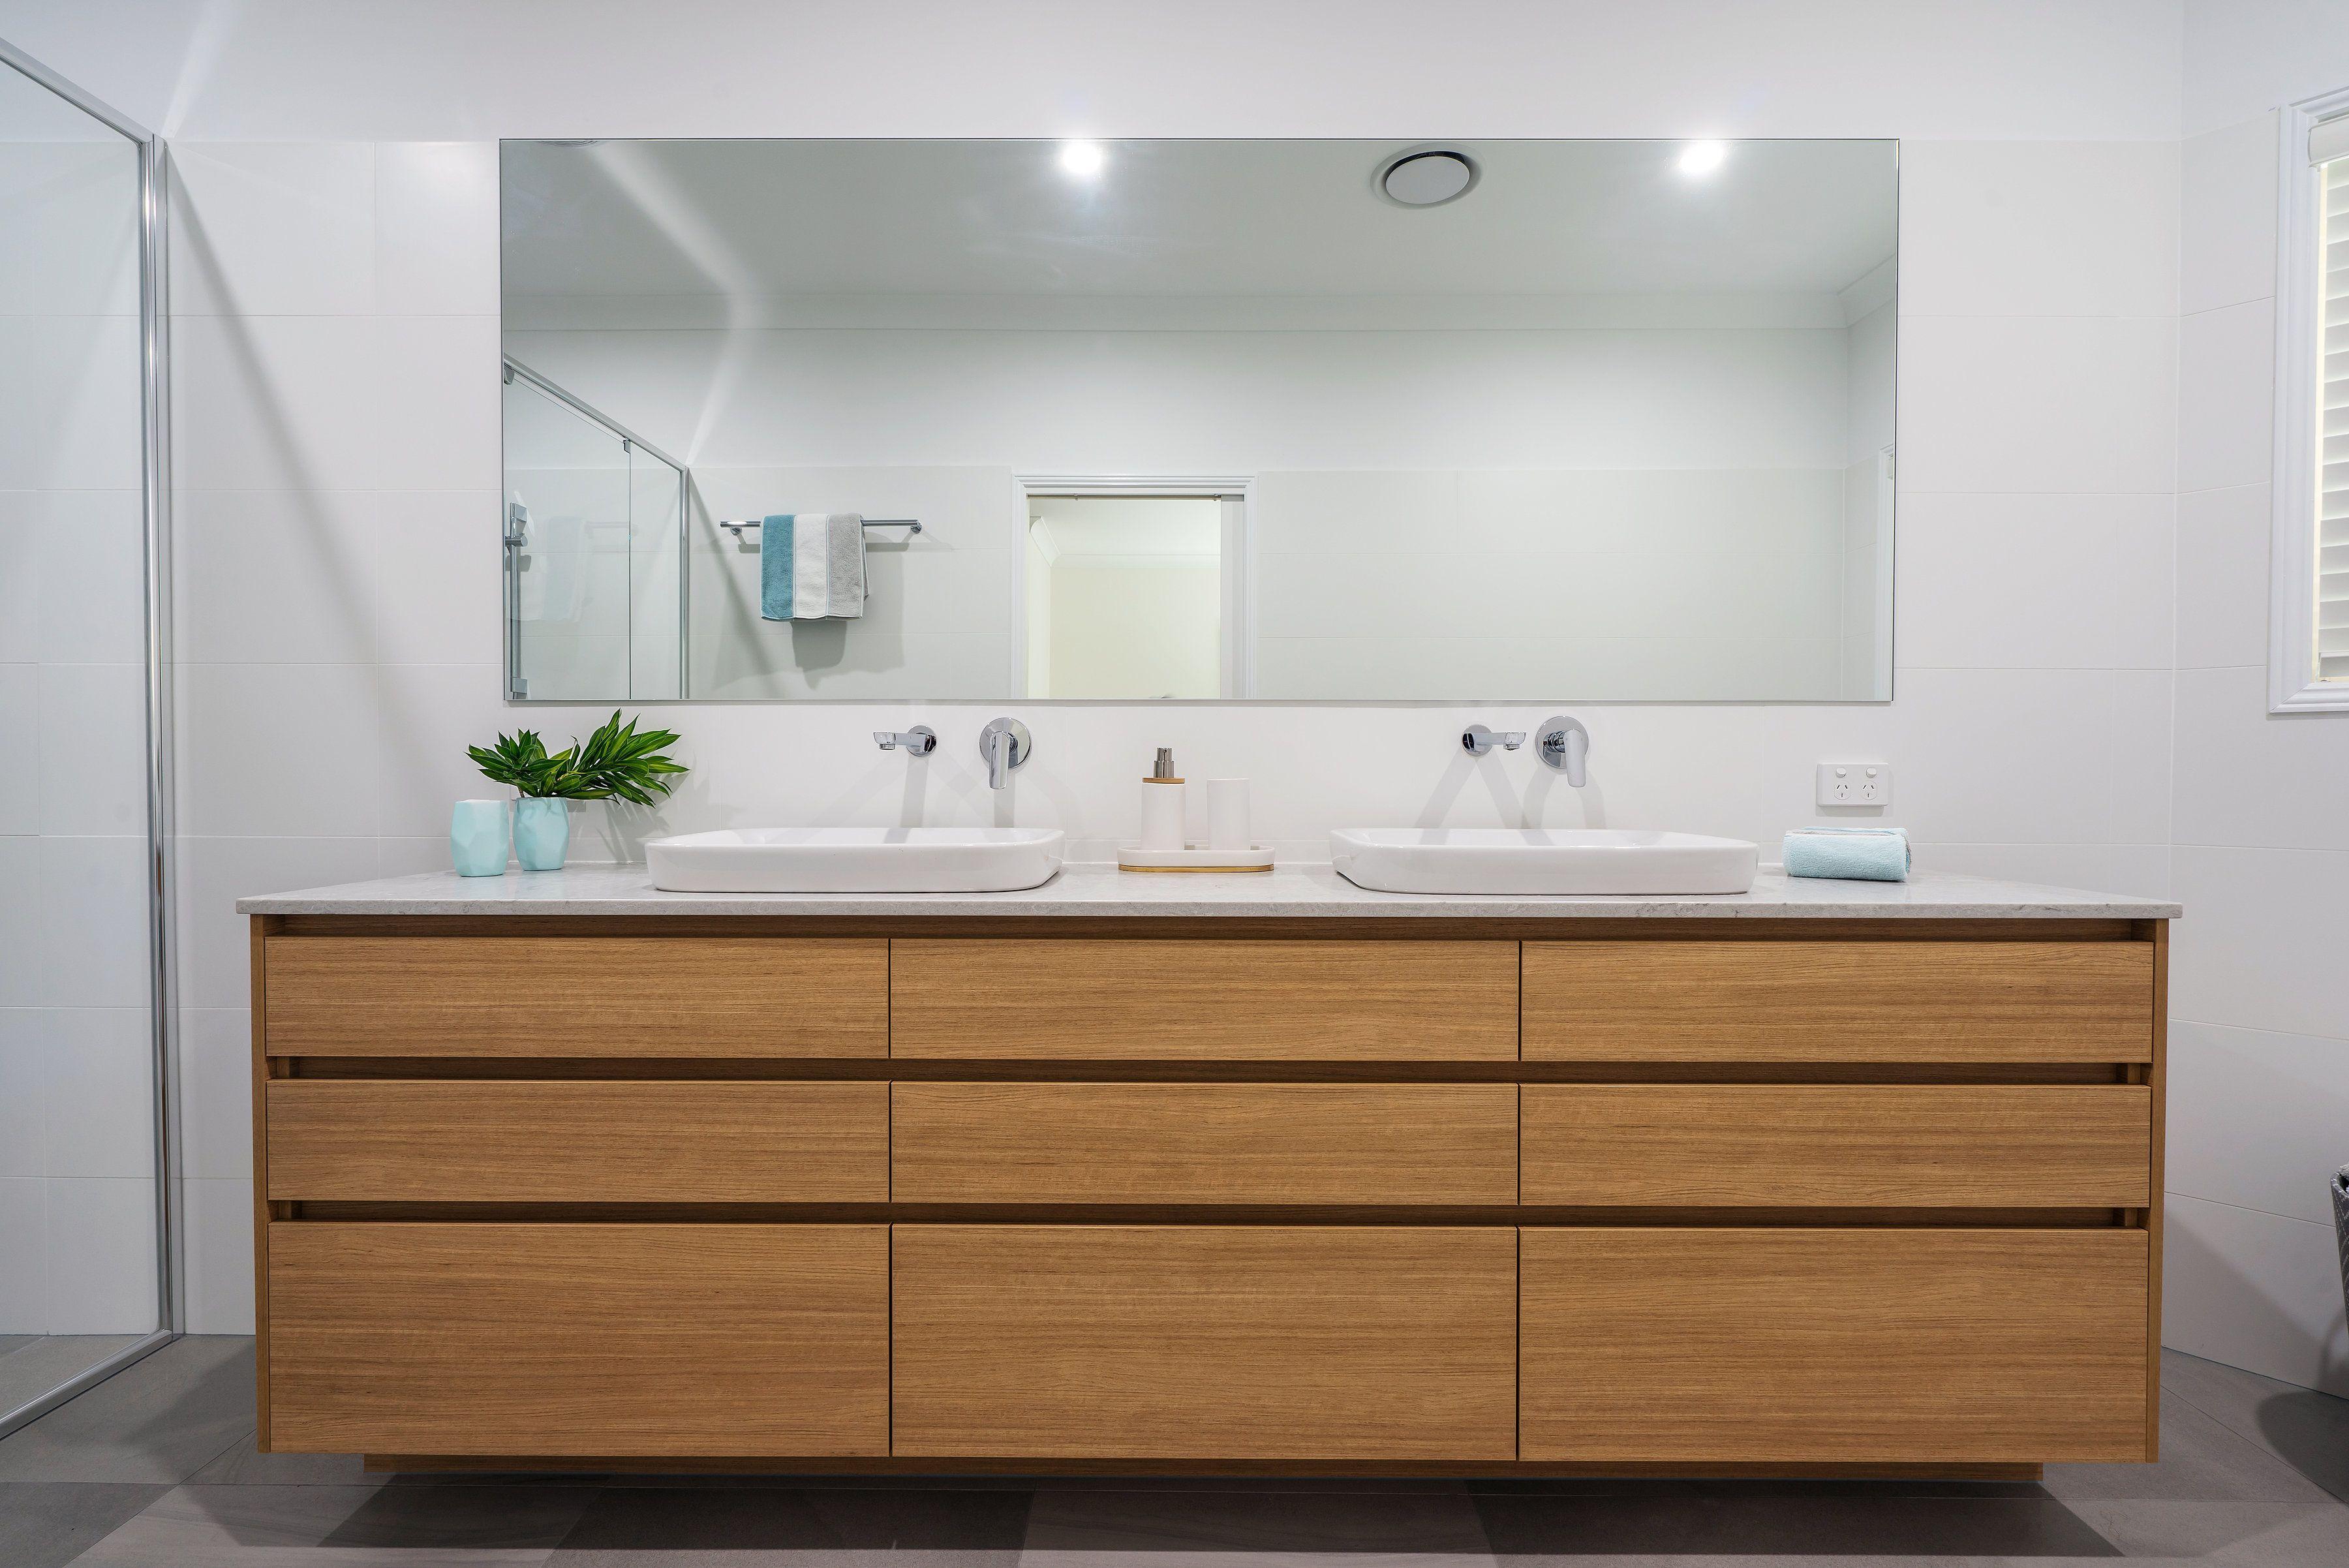 Custom Teak Bathroom Vanity Google Search Teak Bathroom Vanity Teak Bathroom Modern Bathroom Vanity